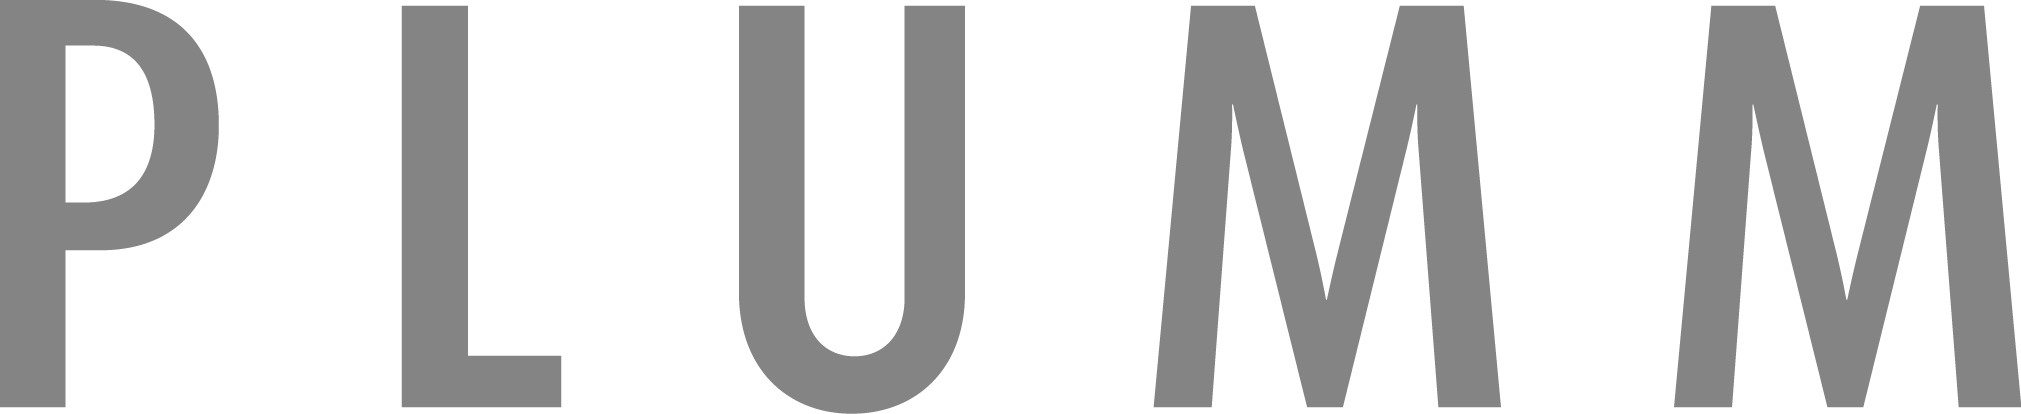 Plumm_Logo_Updated_GR_No-Cork_300dpi_Greyscale.jpg